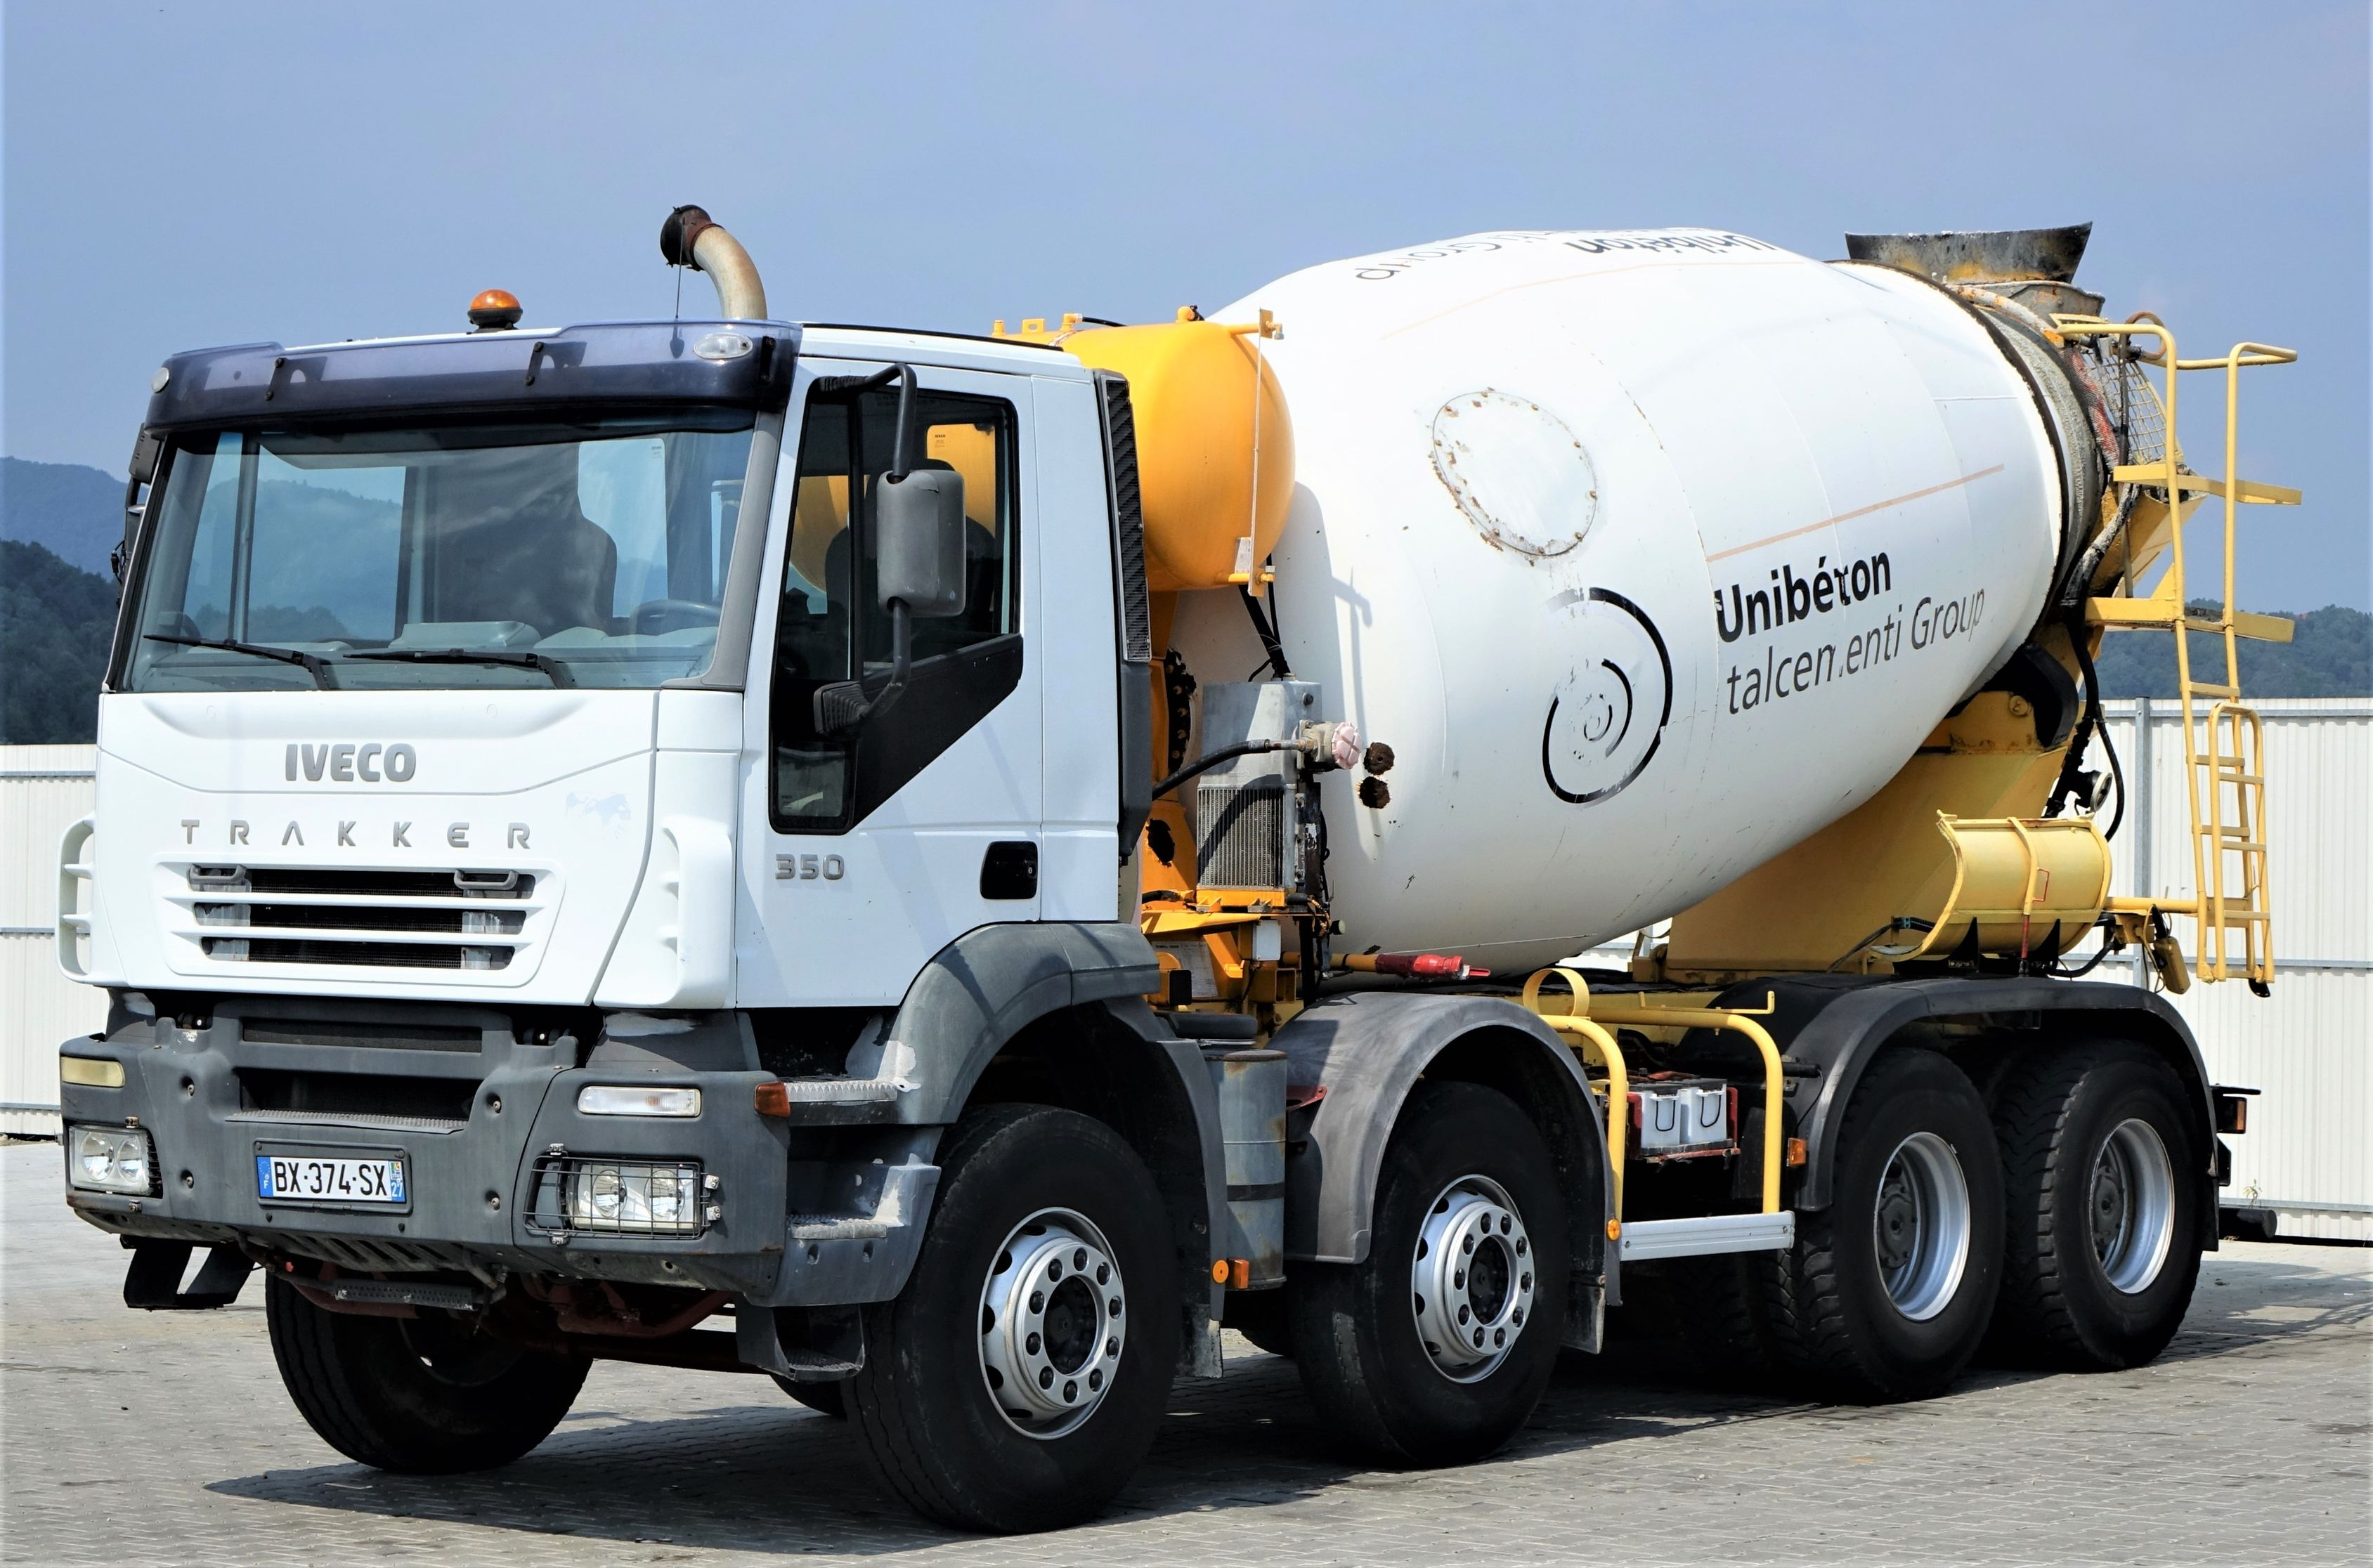 2006-iveco-trakker-350-6370747